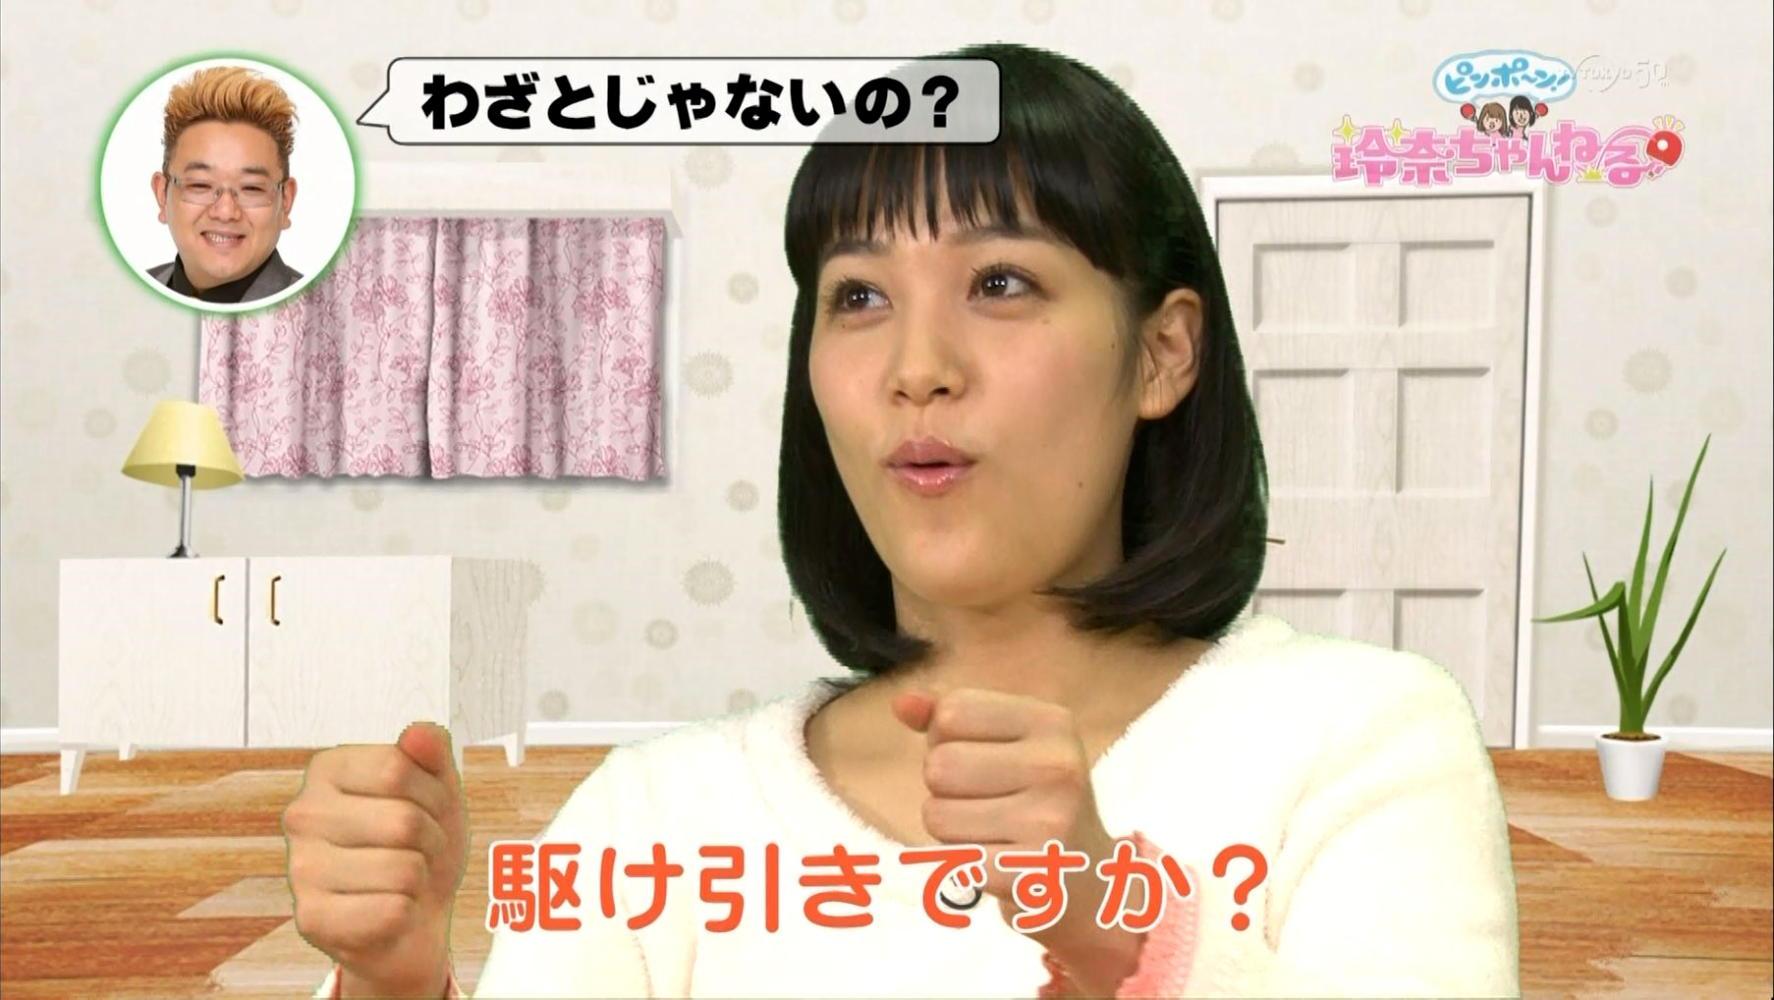 https://i1.wp.com/livedoor.blogimg.jp/ponmorisuke-nagideracchi/imgs/8/1/81df2a0c.jpg